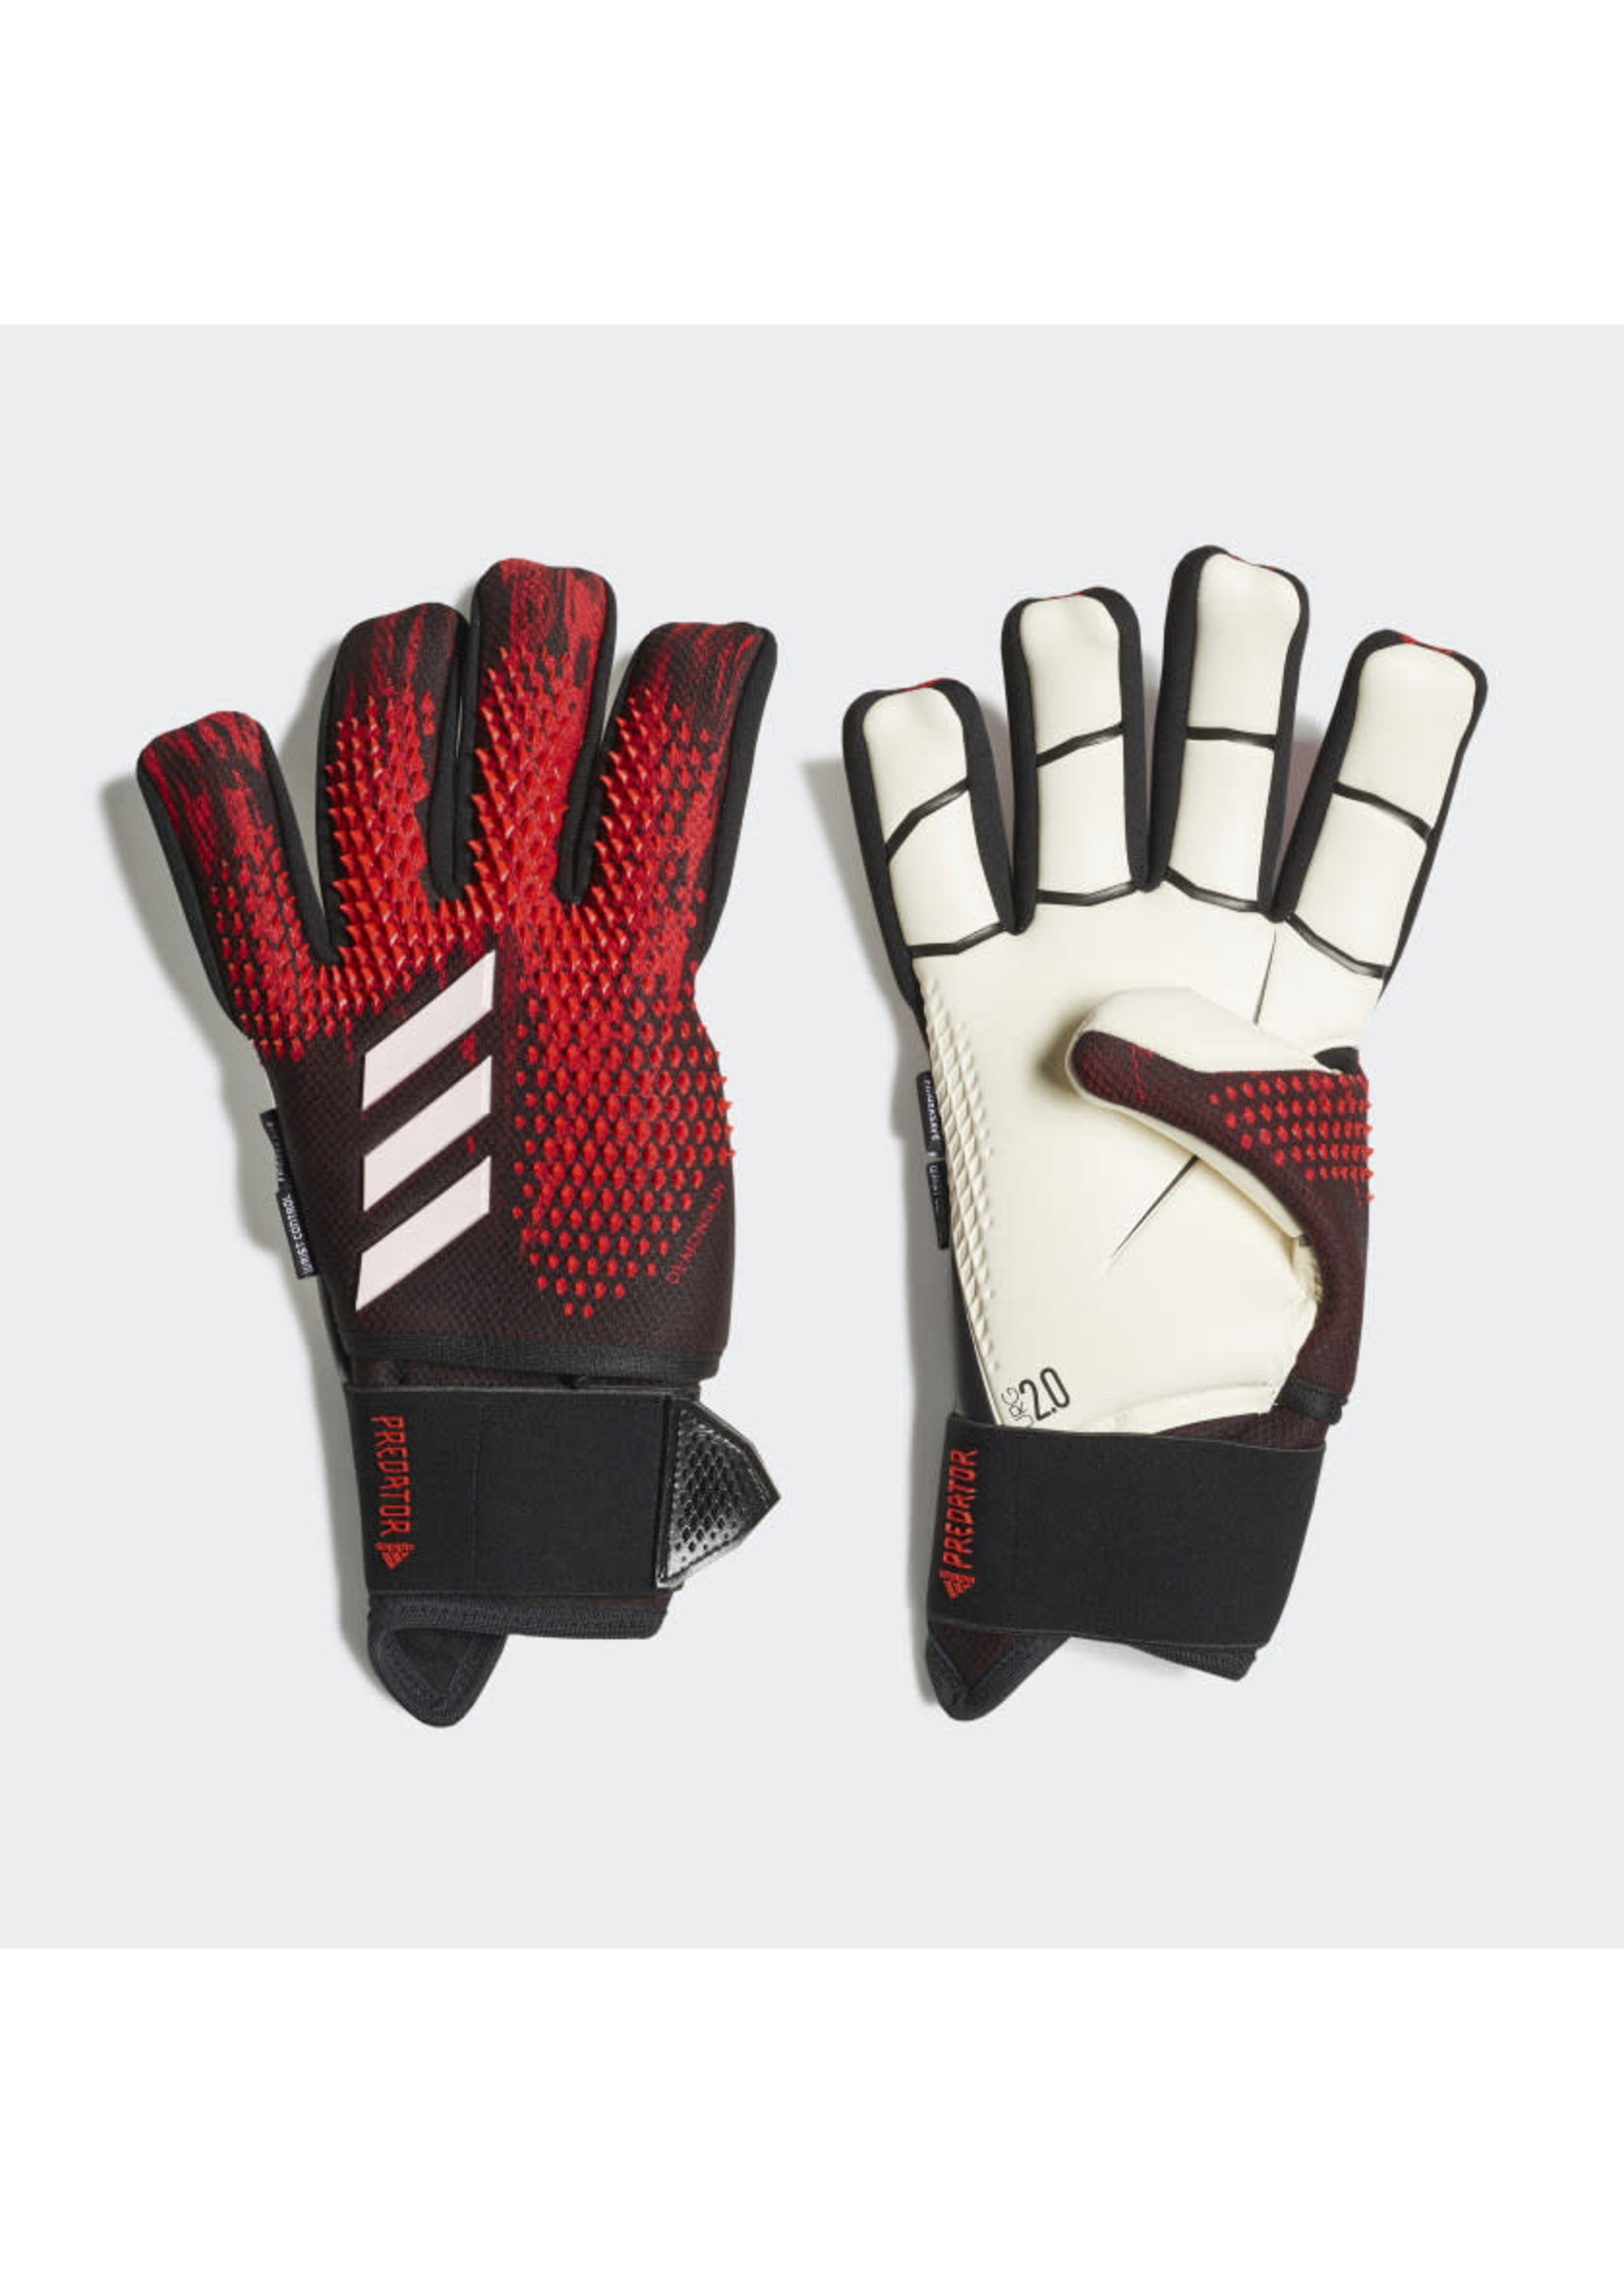 Adidas PRED GL PRO ULT